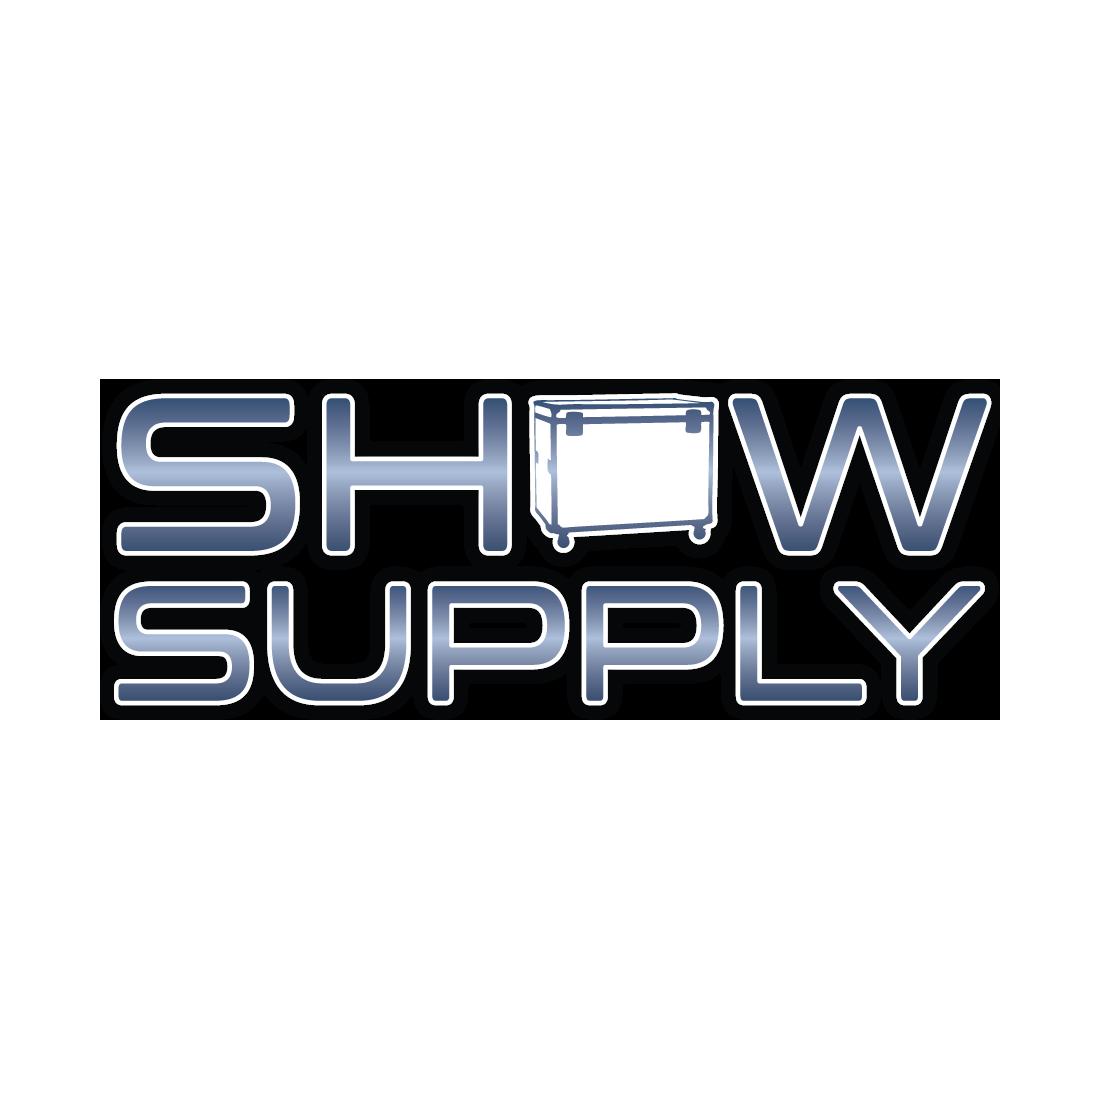 SW6000 Conference Management Software, Version 6.8 - Advanced Meeting Management Module (50 Max. Meeting Participants)